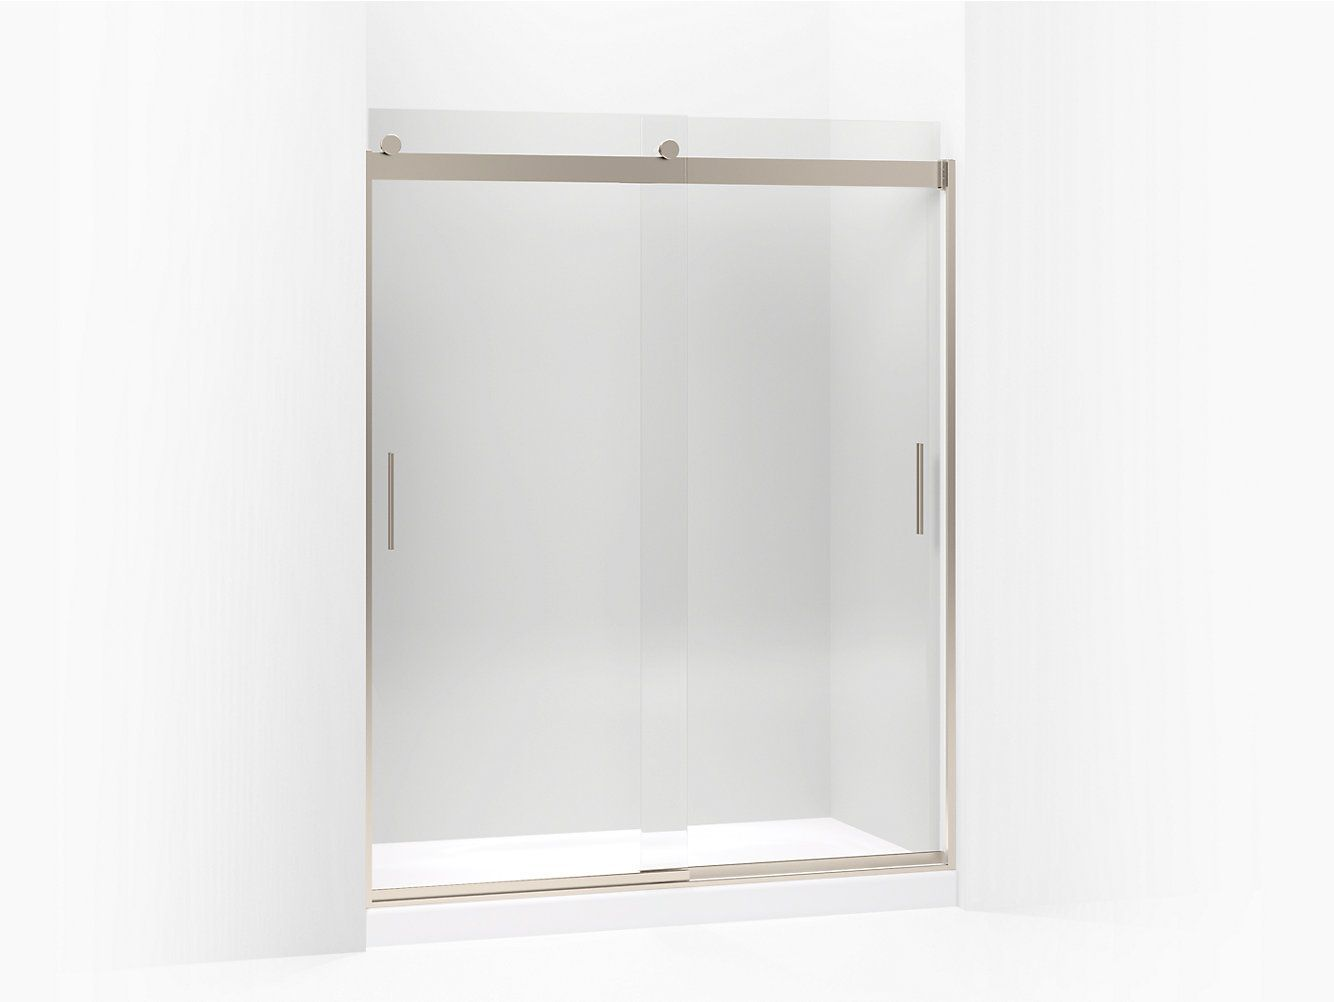 K 706009 L With Images Frameless Sliding Shower Doors Shower